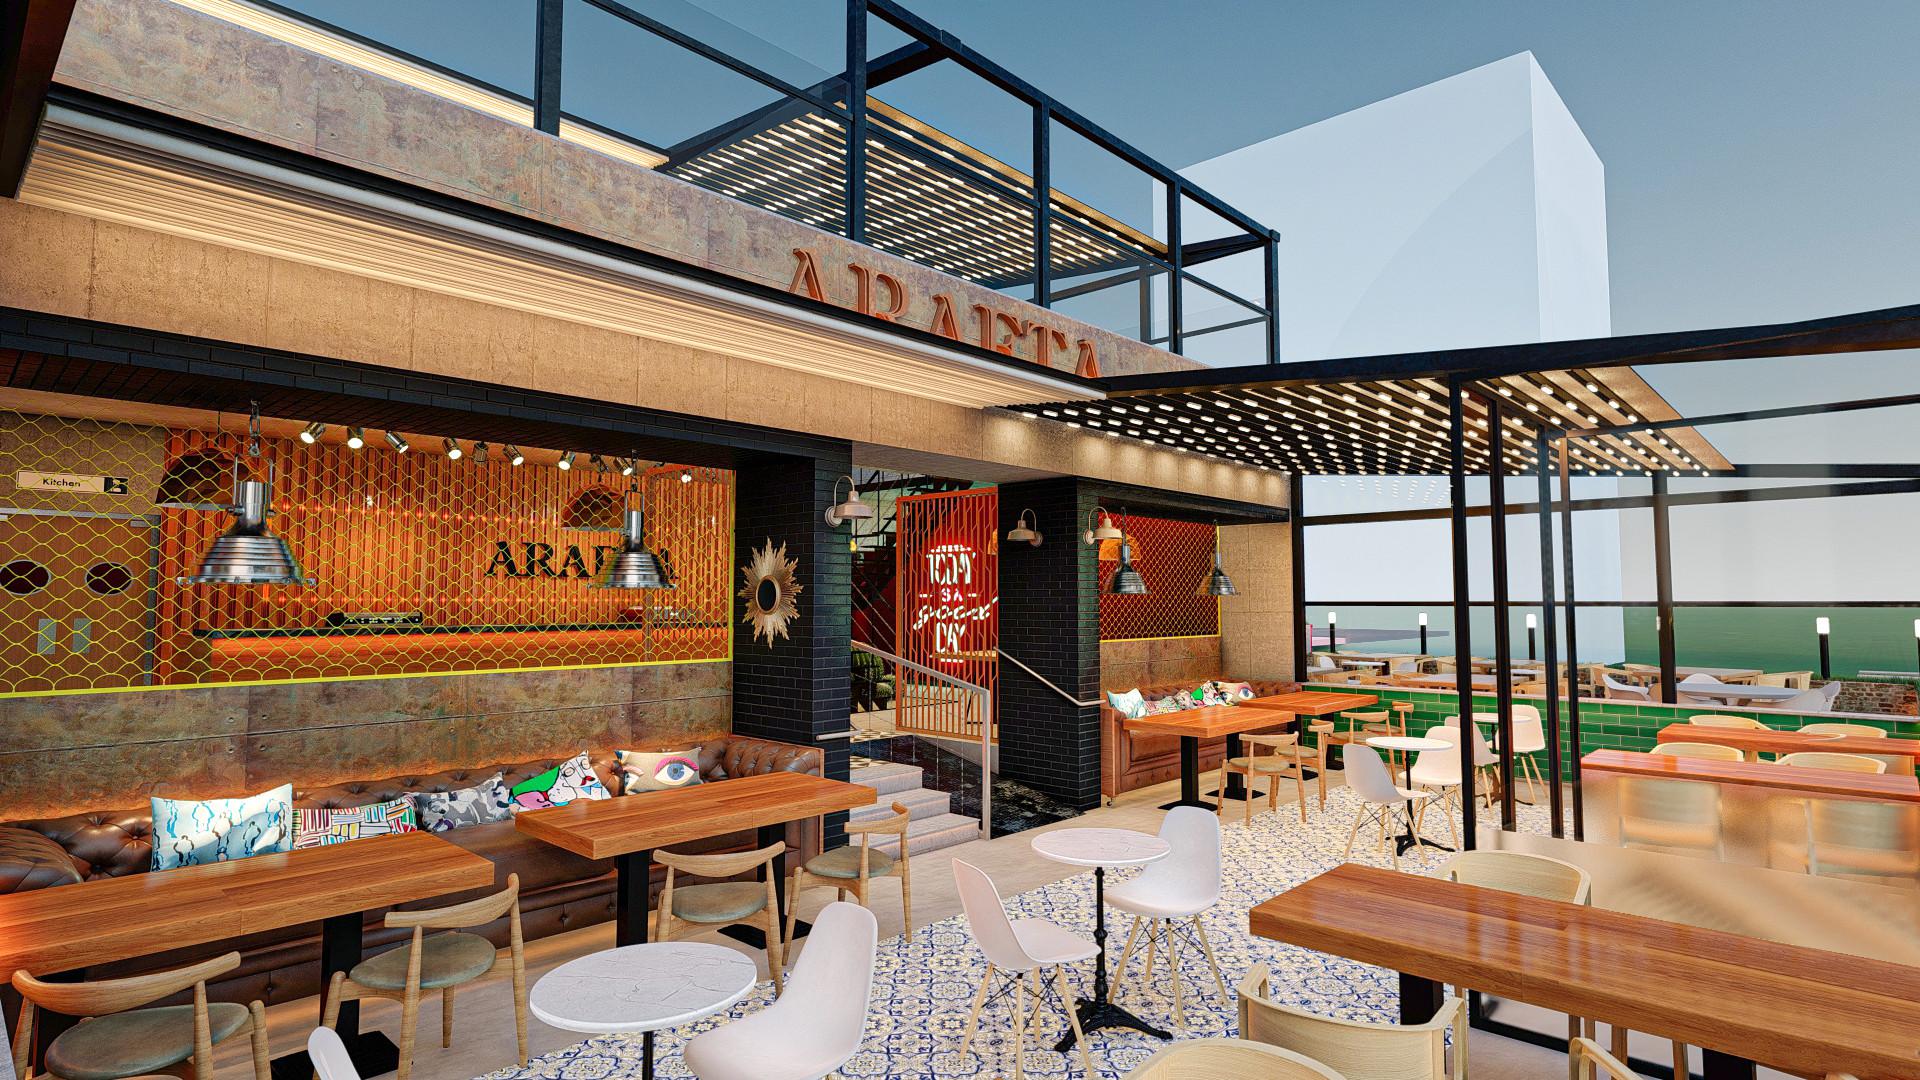 Arafta Kafe